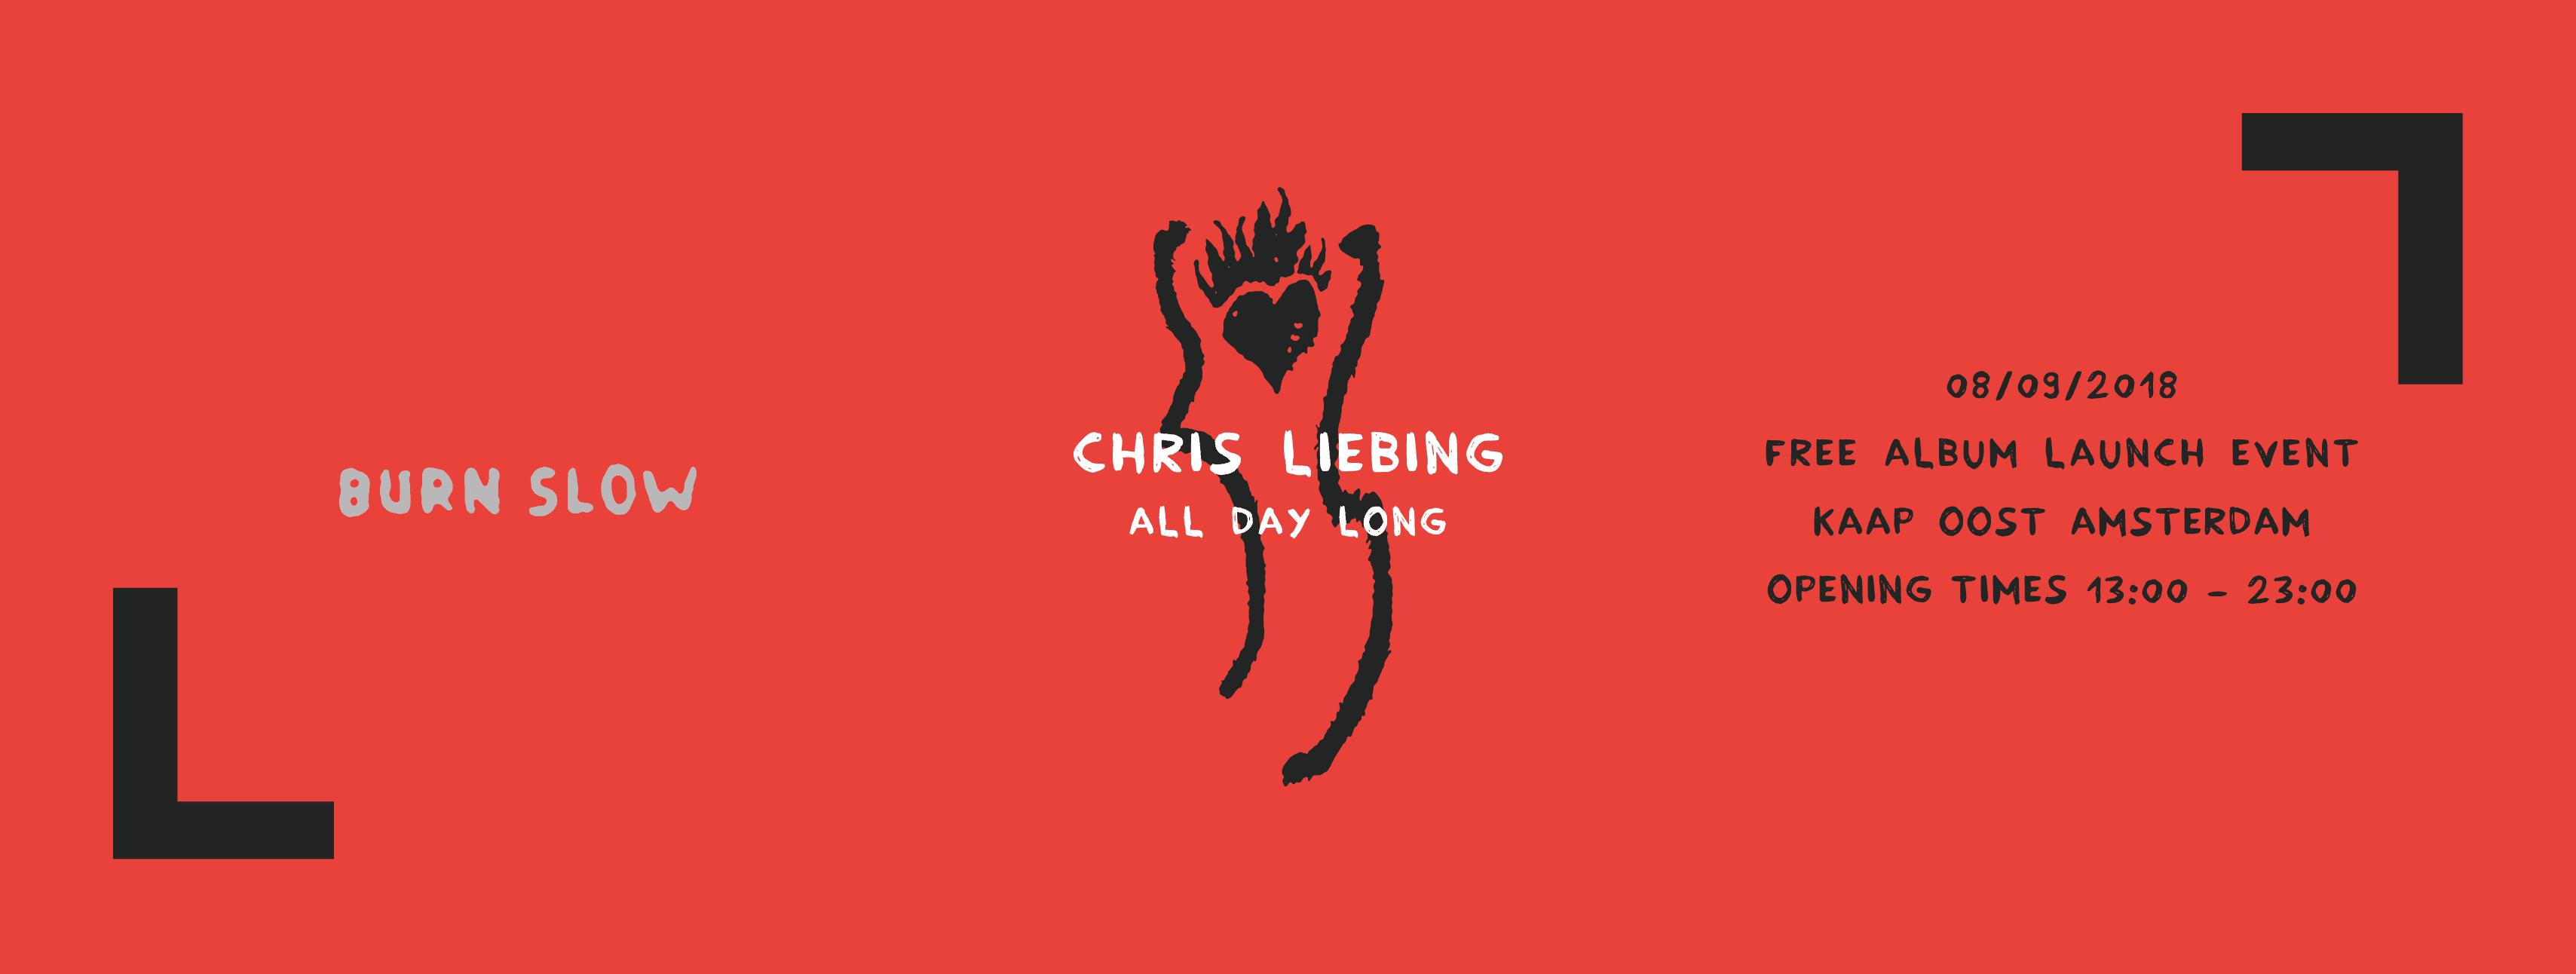 2018_burn_slow_album_launch_artwork_820x310.png